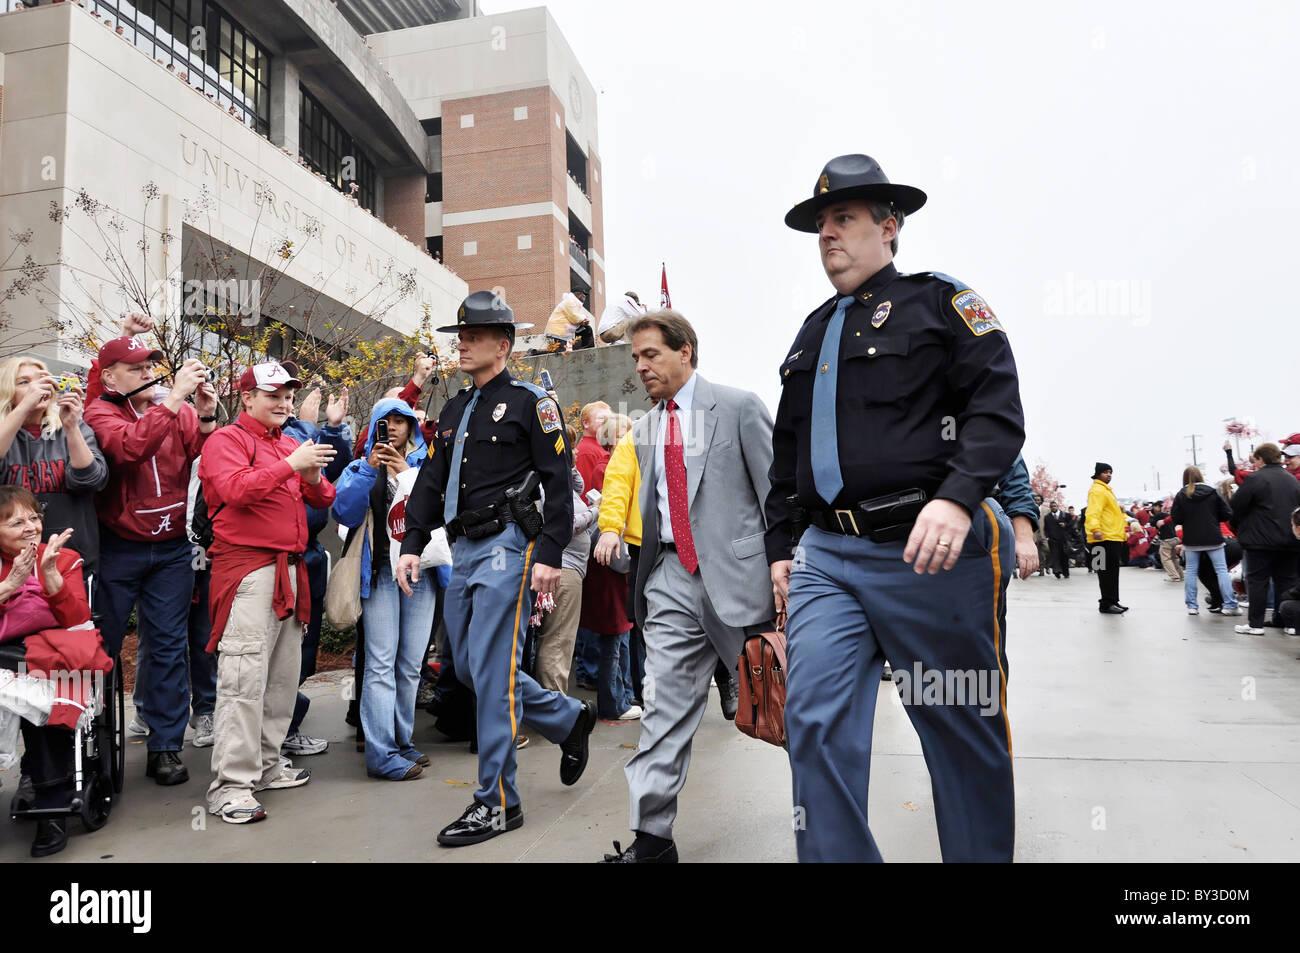 University of Alabama football coach Nick Saban arriving at Bryant Denny Stadium in Tuscaloosa, Alabama before football - Stock Image